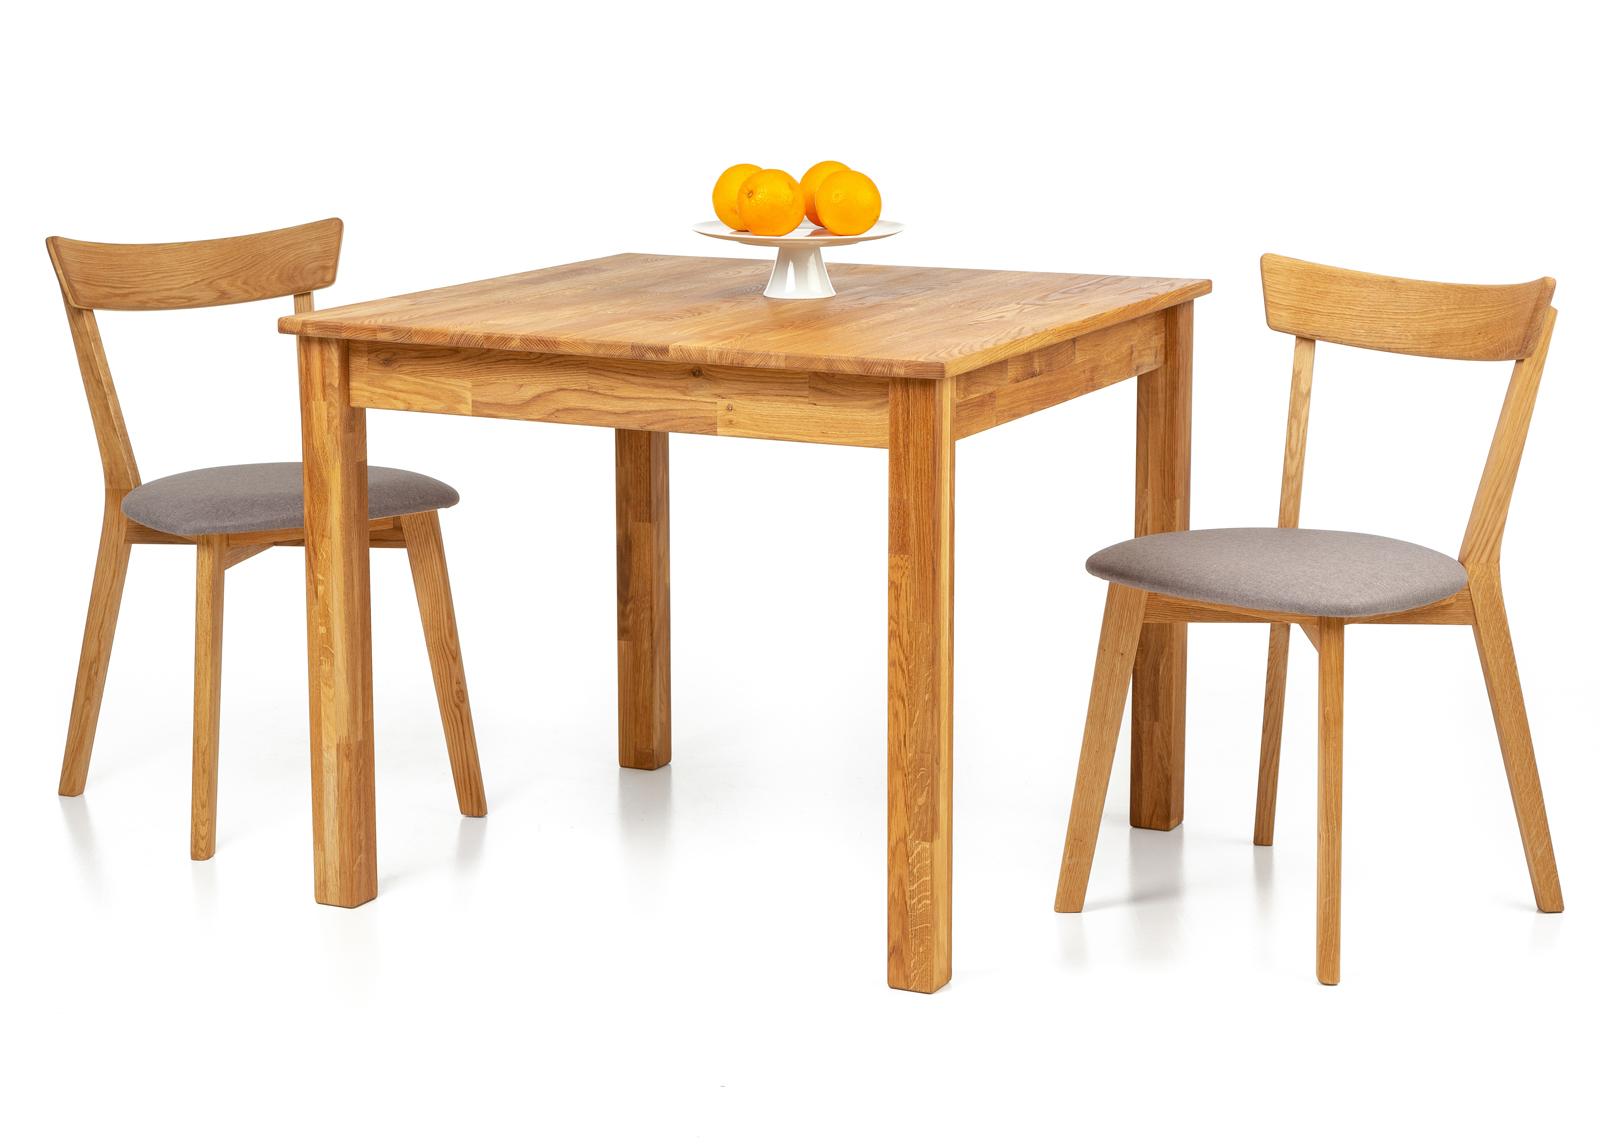 Tammi ruokapöytä Lem 90x90 cm + 2 tuolia Viola harmaa